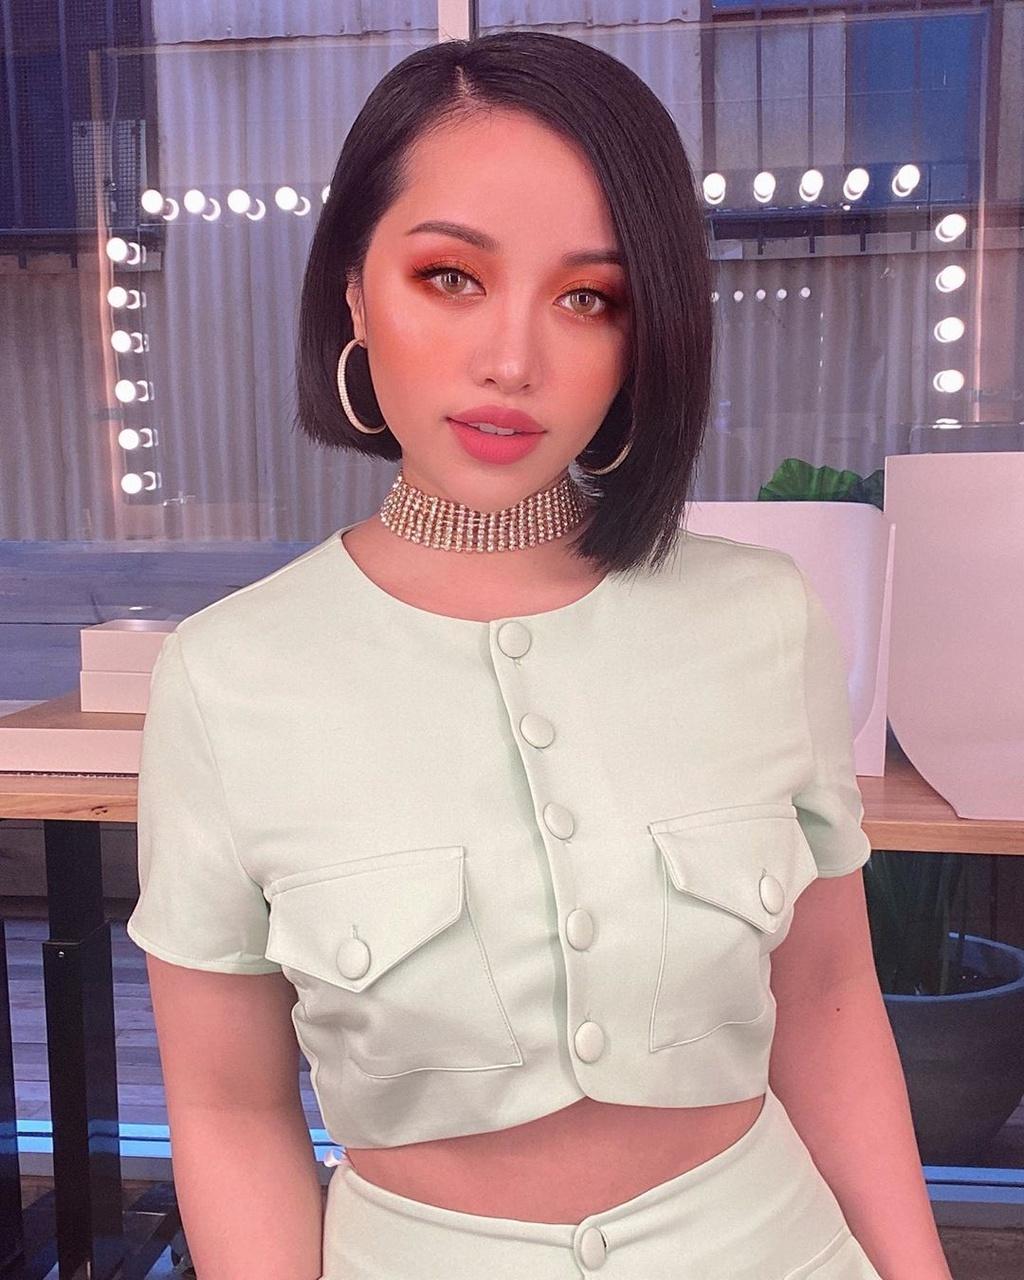 Cuoc song cua Michelle Phan sau khi tuyen bo roi bo YouTube anh 4